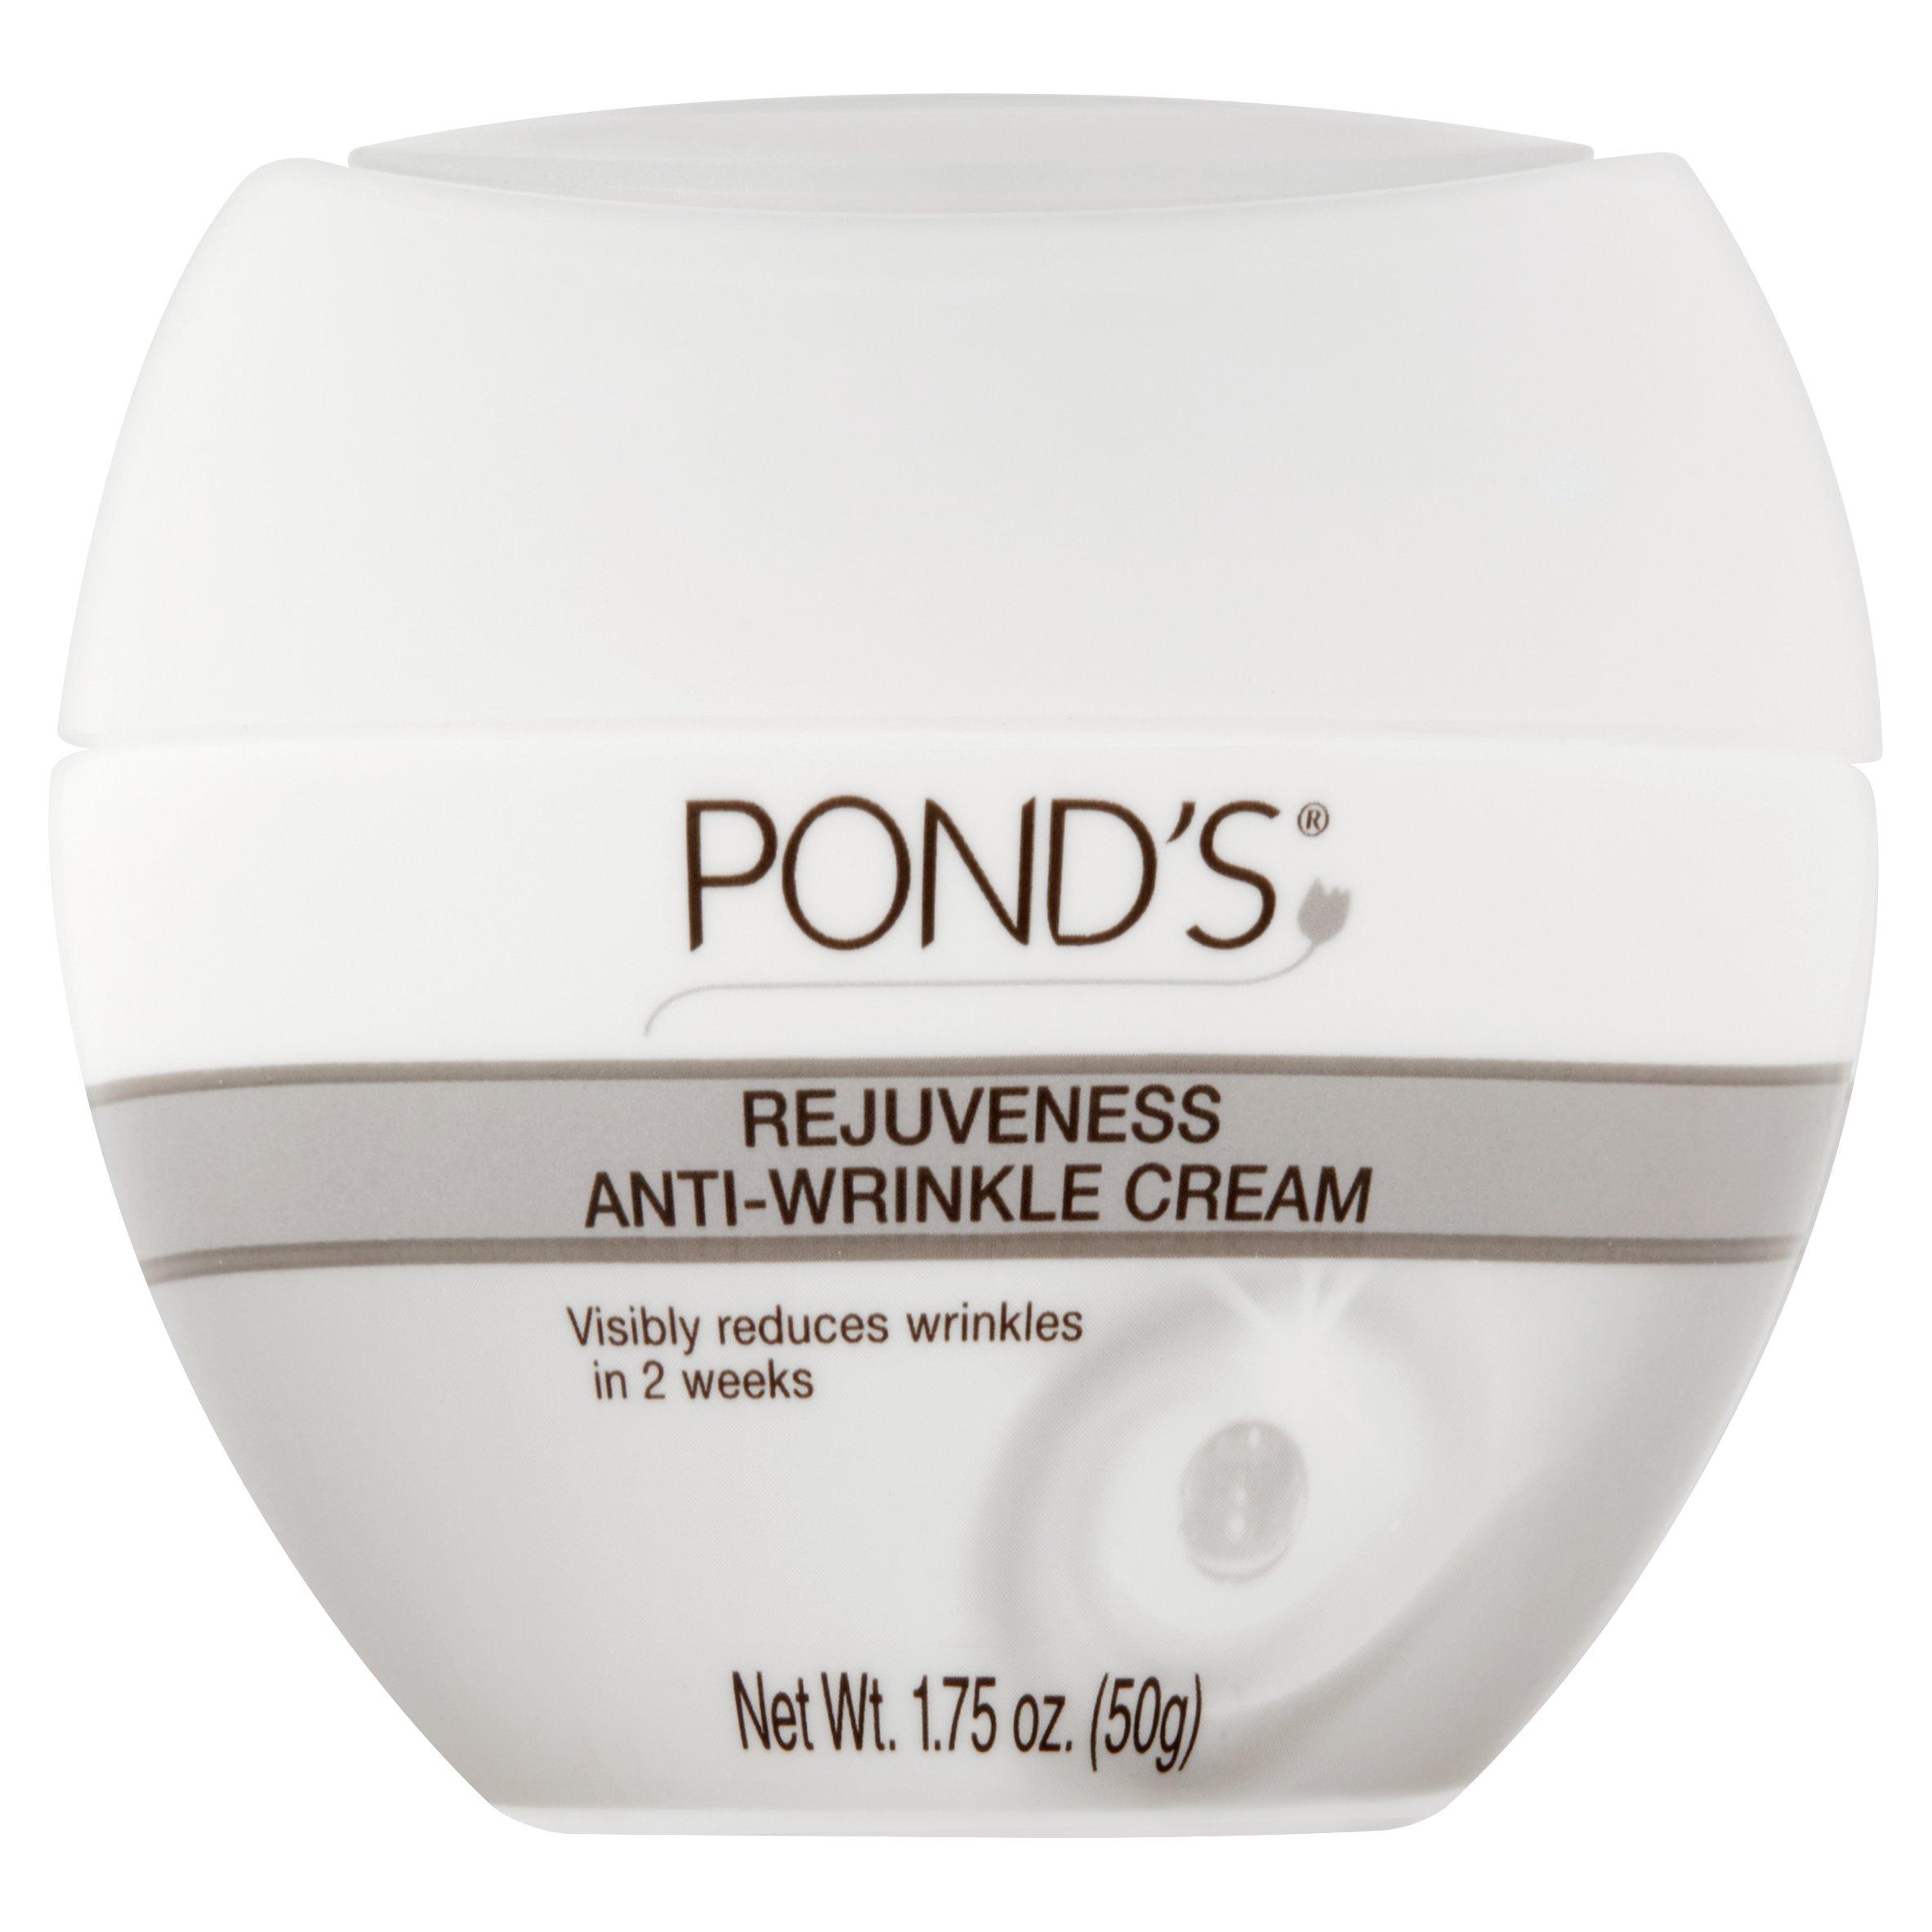 Pond's Rejuveness Anti-Wrinkle Cream, 1.75 oz